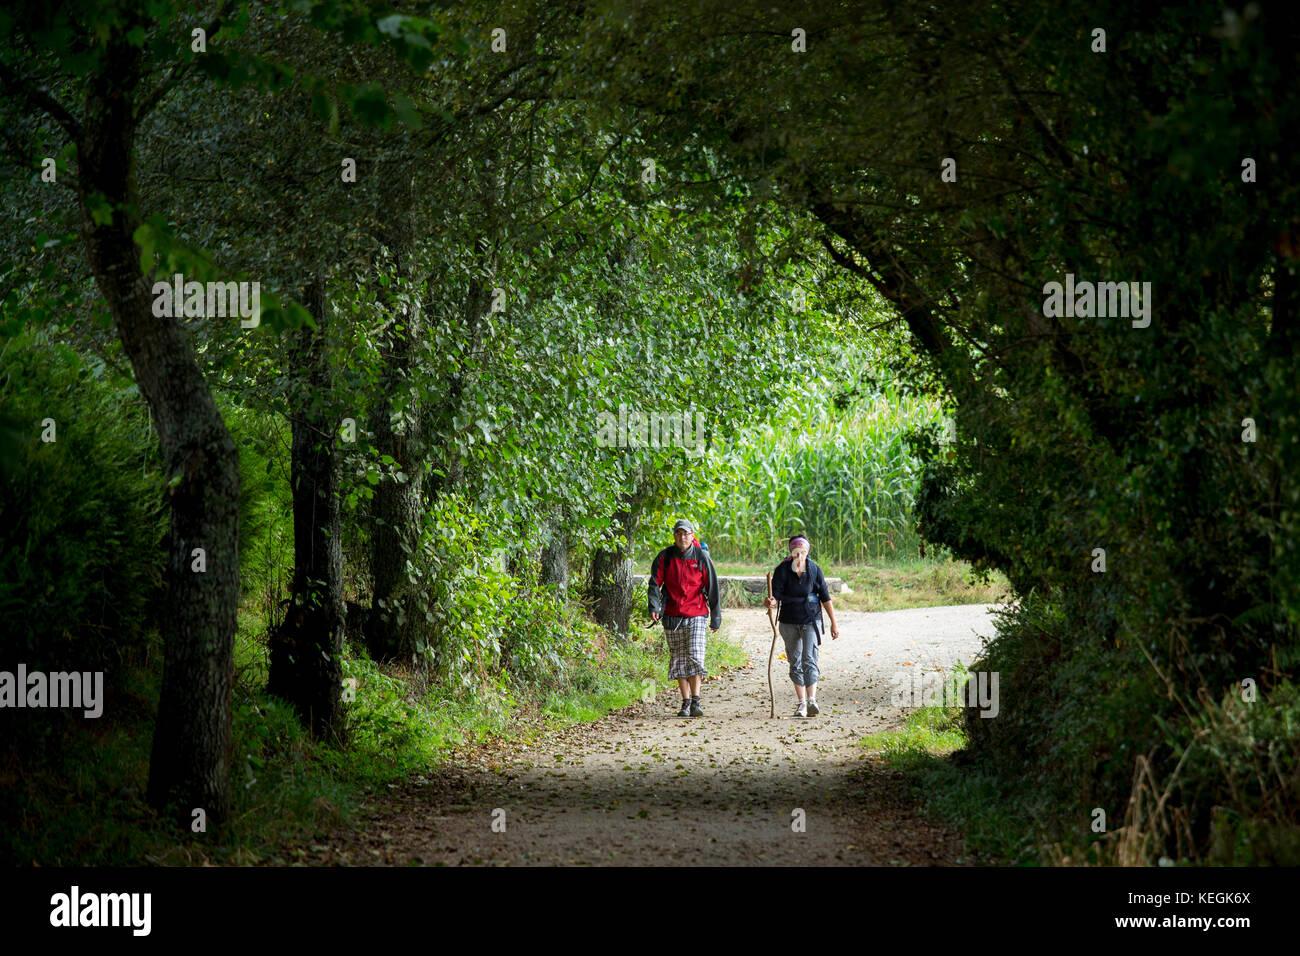 Pilgrim couple on the Camino de Santiago PIlgrim's Way to Santiago de Compostela in Galicia, Spain - Stock Image